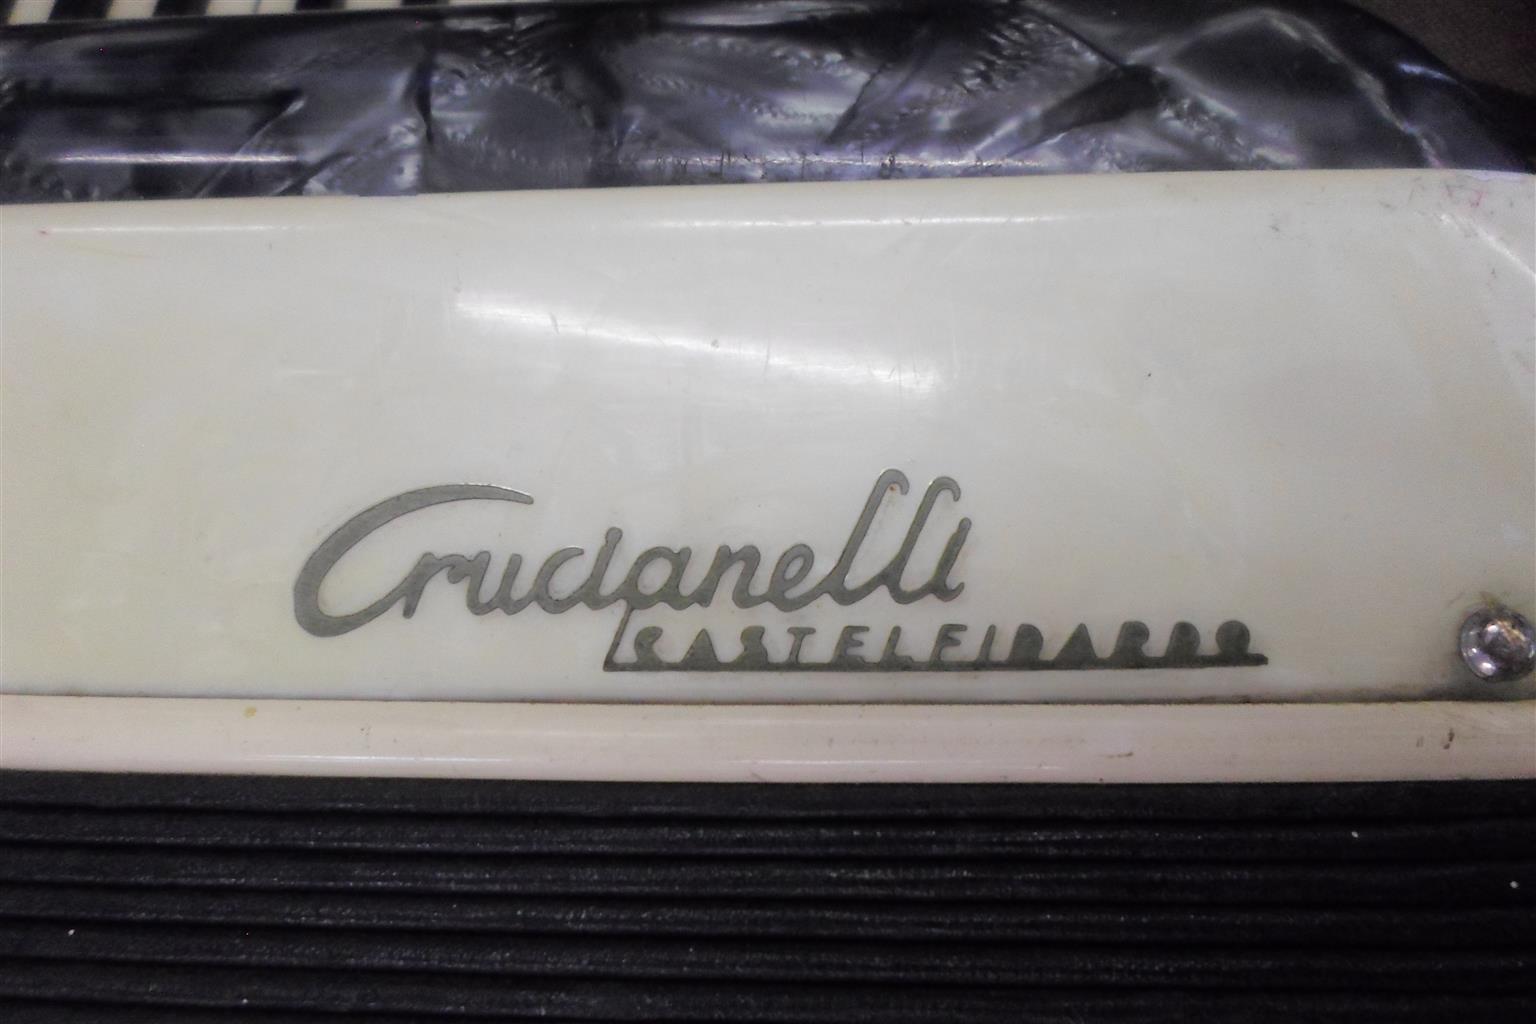 Crucianelli Castelfidardo Accordion